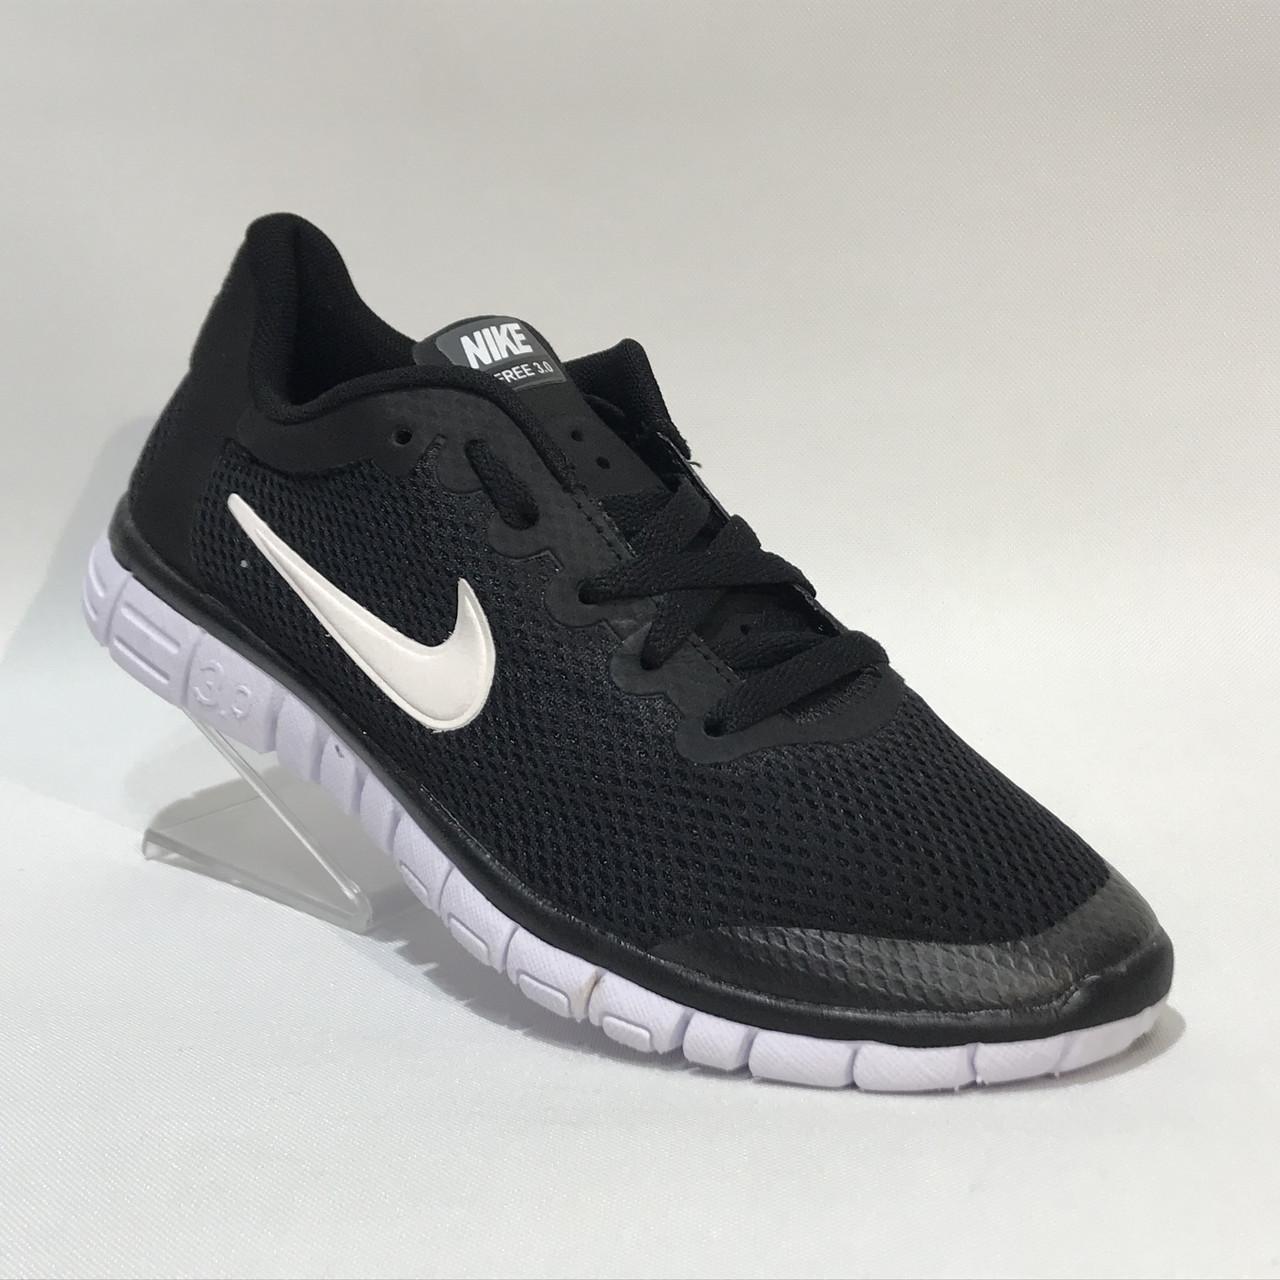 3eedc1d628b Кроссовки мужские Nike Free Run 3.0 сетка черные (найк фри ран ...